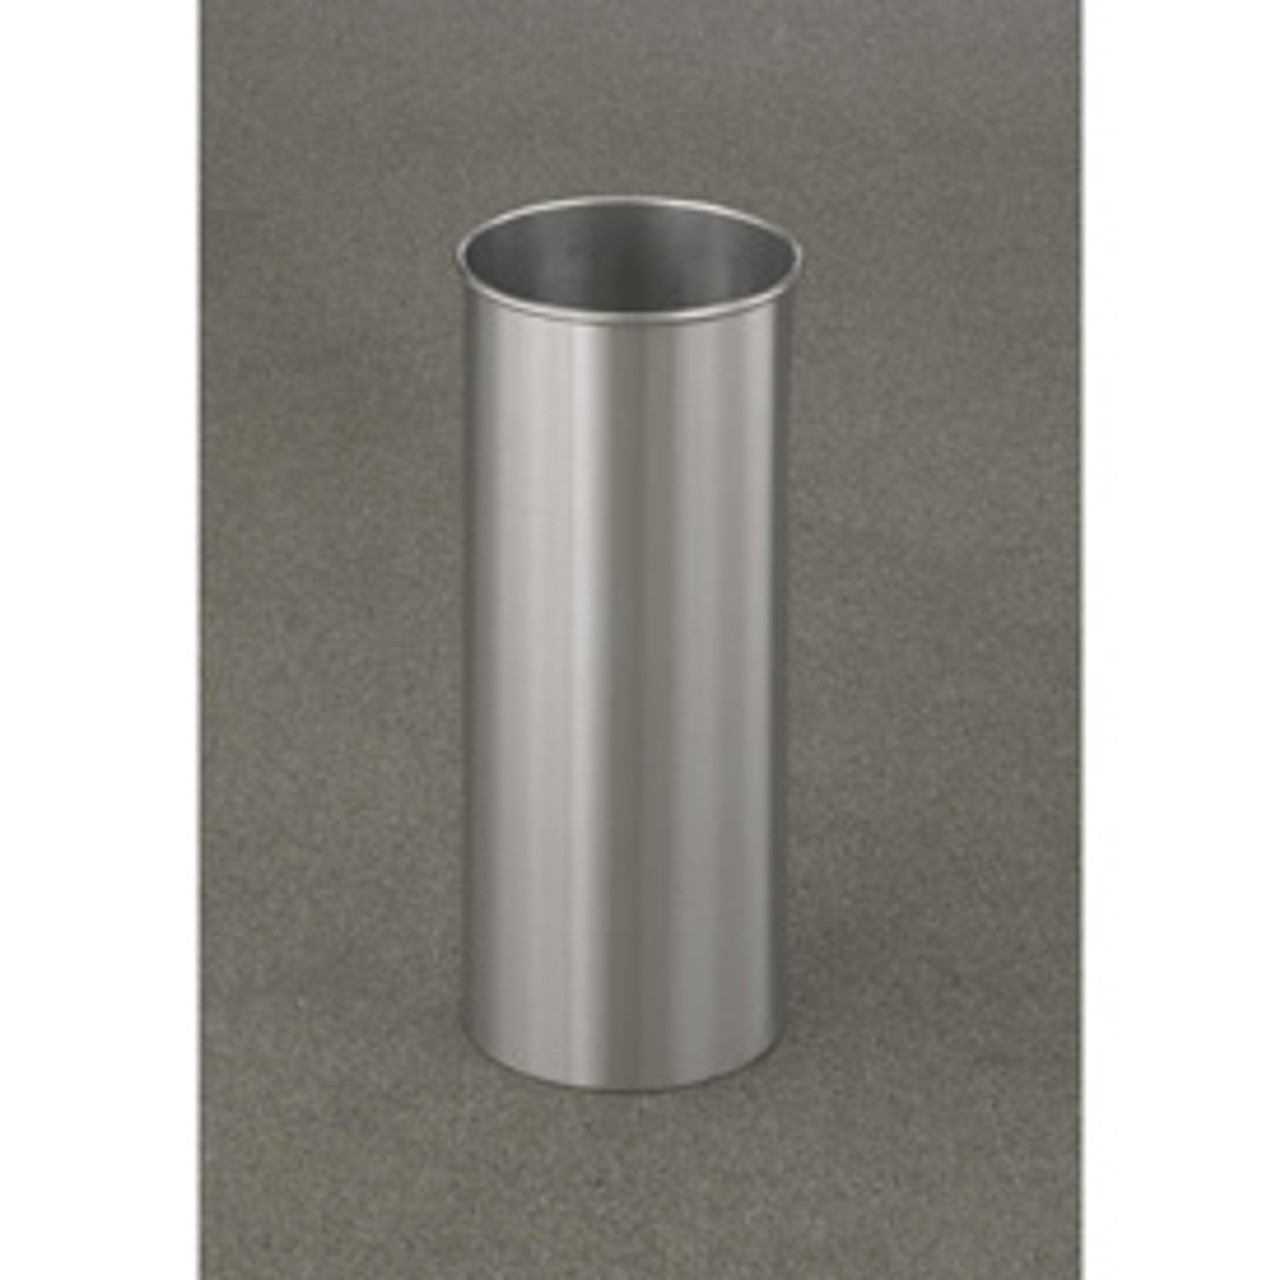 7 Gallon 9 x 23 Open Top Home Office Wastebasket Satin Aluminum